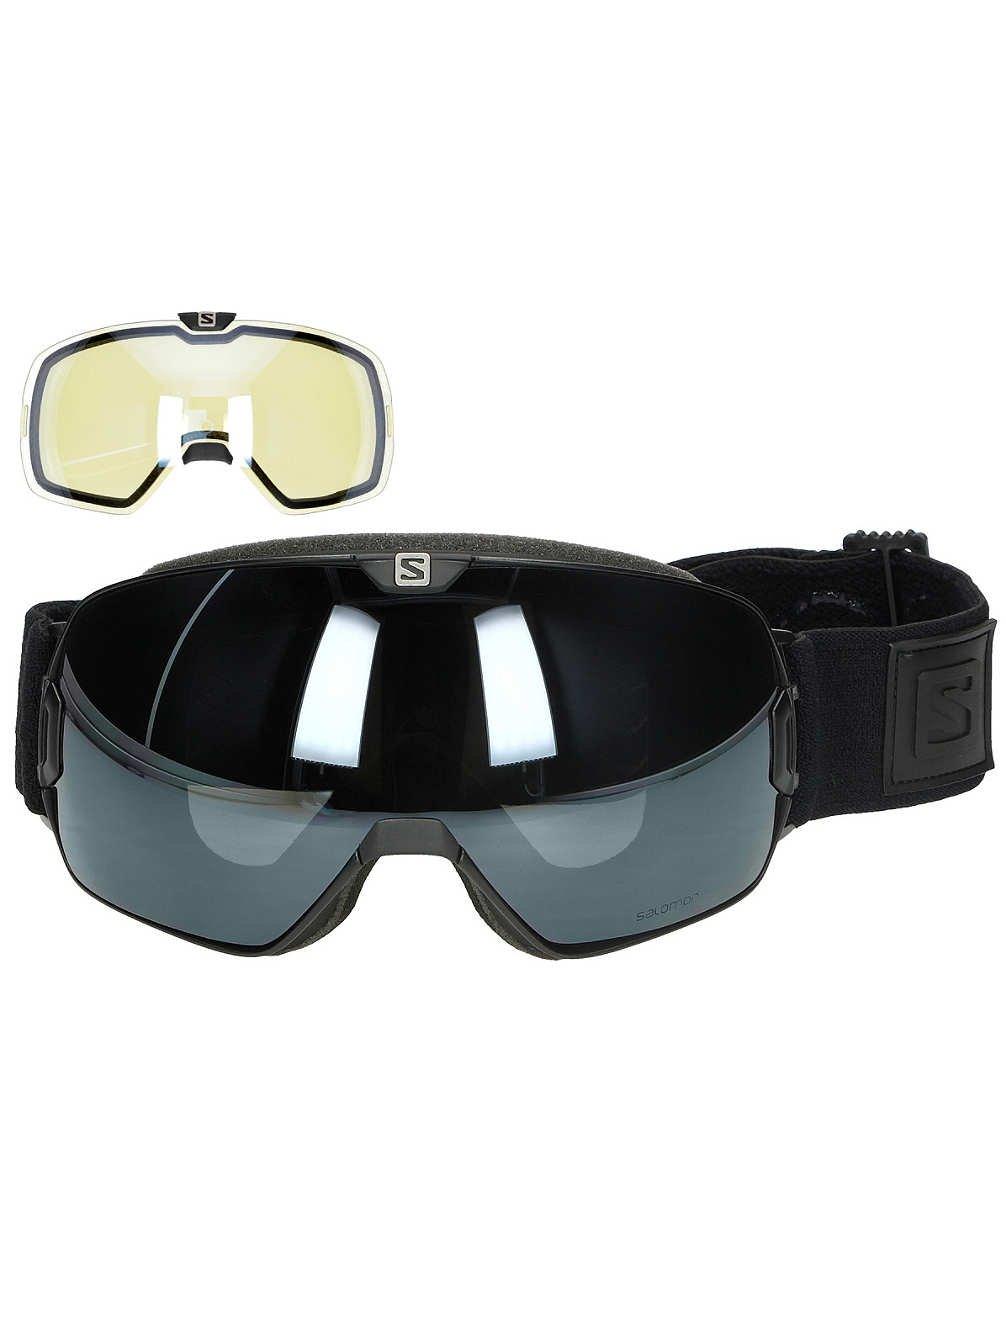 Salomon Xmax & Xtra Lens Googles, Black